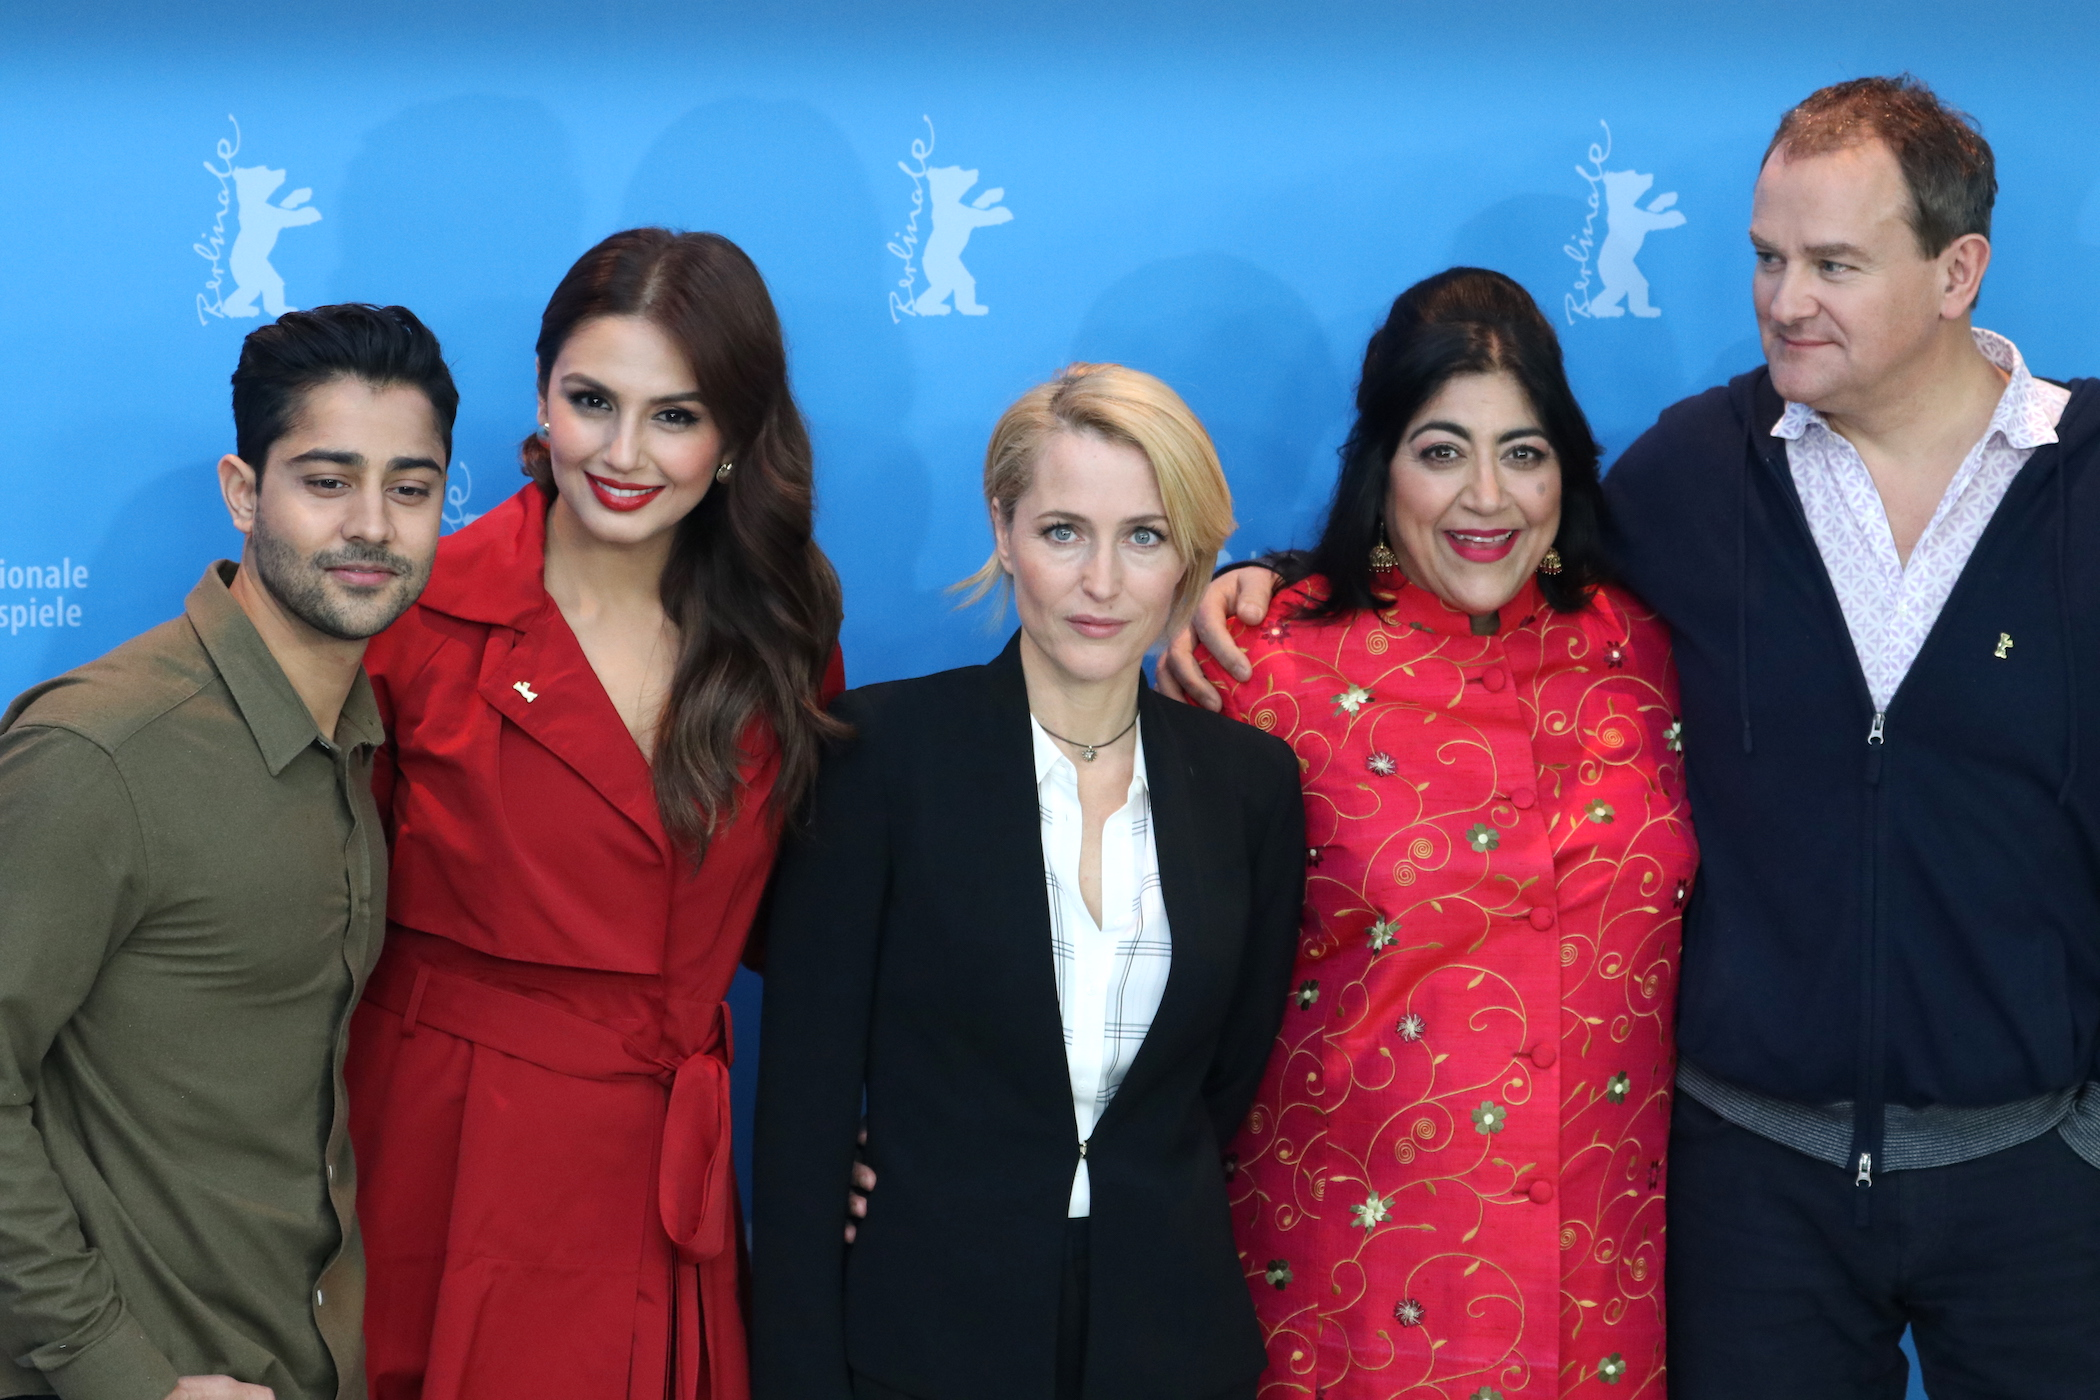 Berlino 2017: Gillian Anderson, Manish Dayal, Hugh Bonneville, Huma Qureshi e Gurinder Chadha al photocall di Viceroy's House